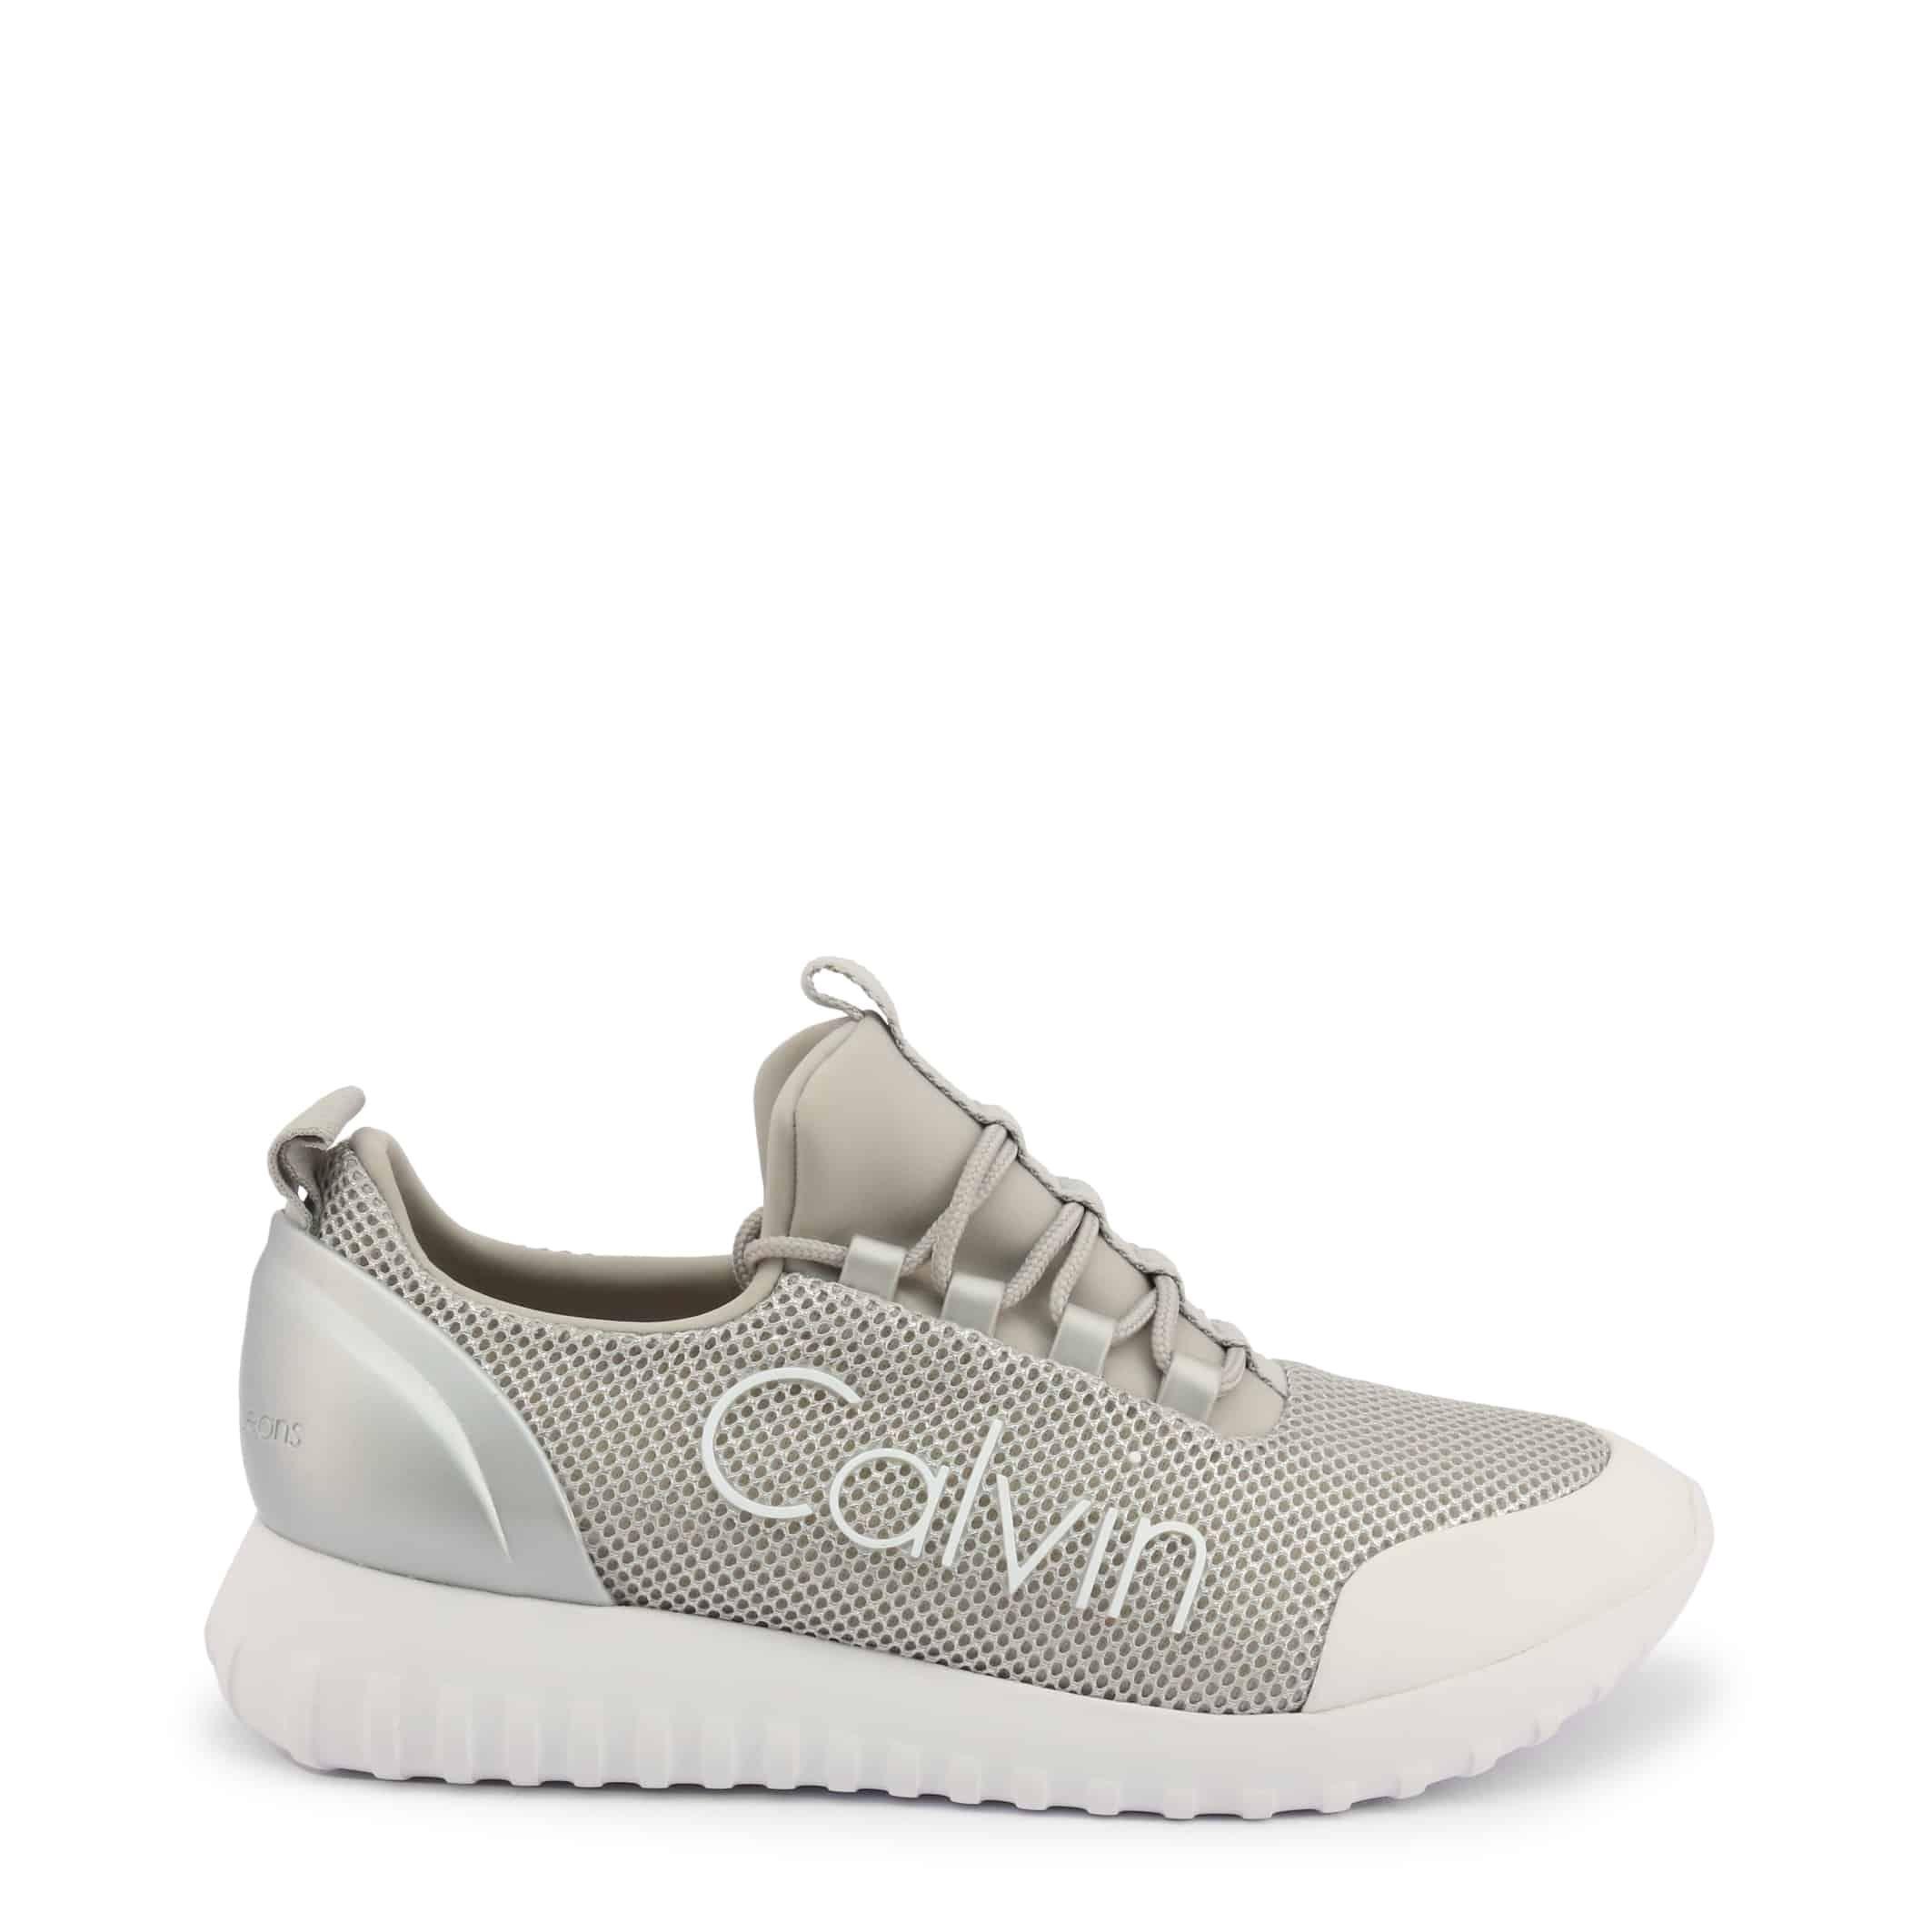 Calvin Klein – REIKA_B4RE9853